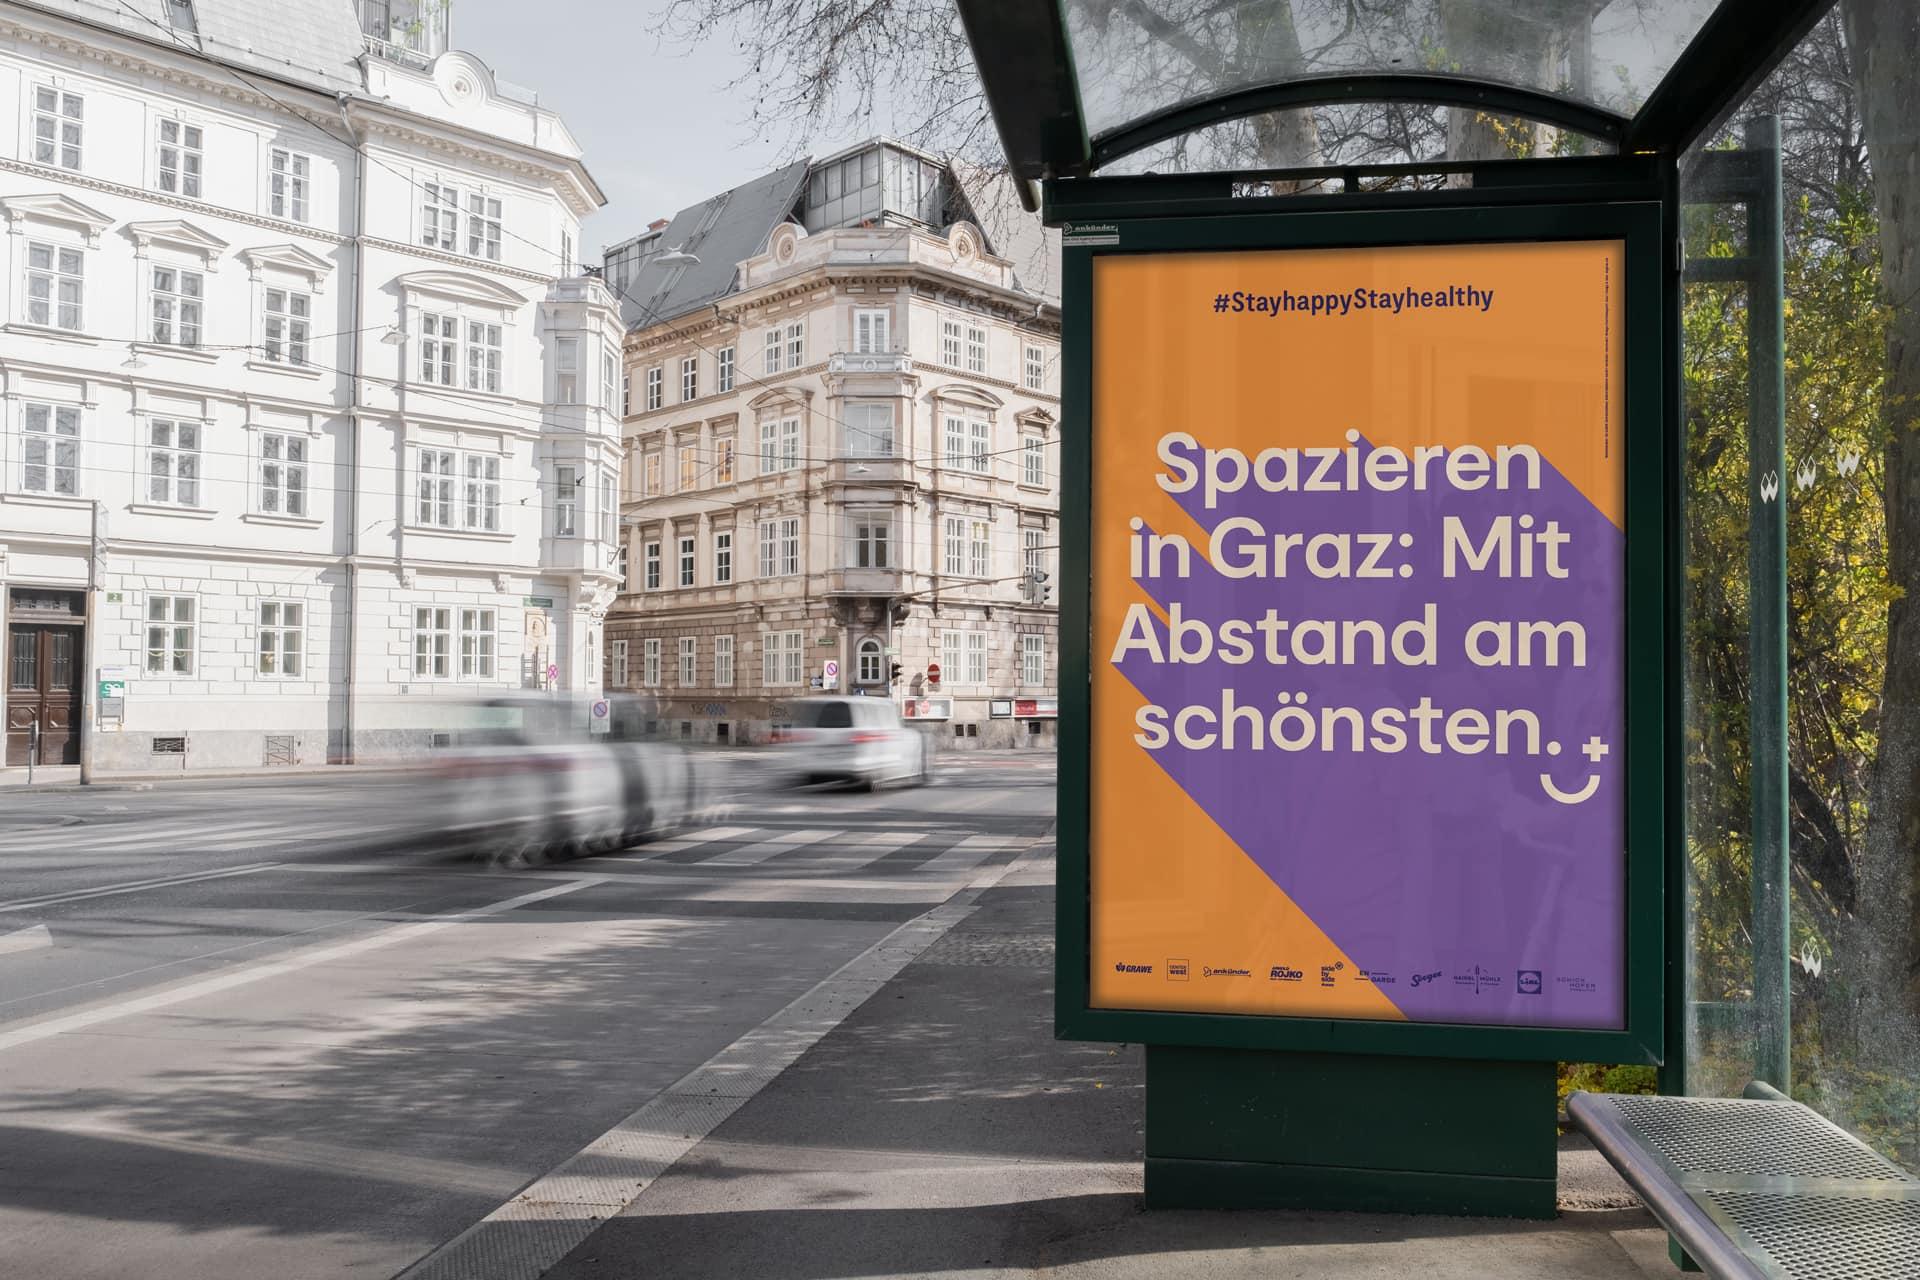 Corona #stayhappy Graz CityLight